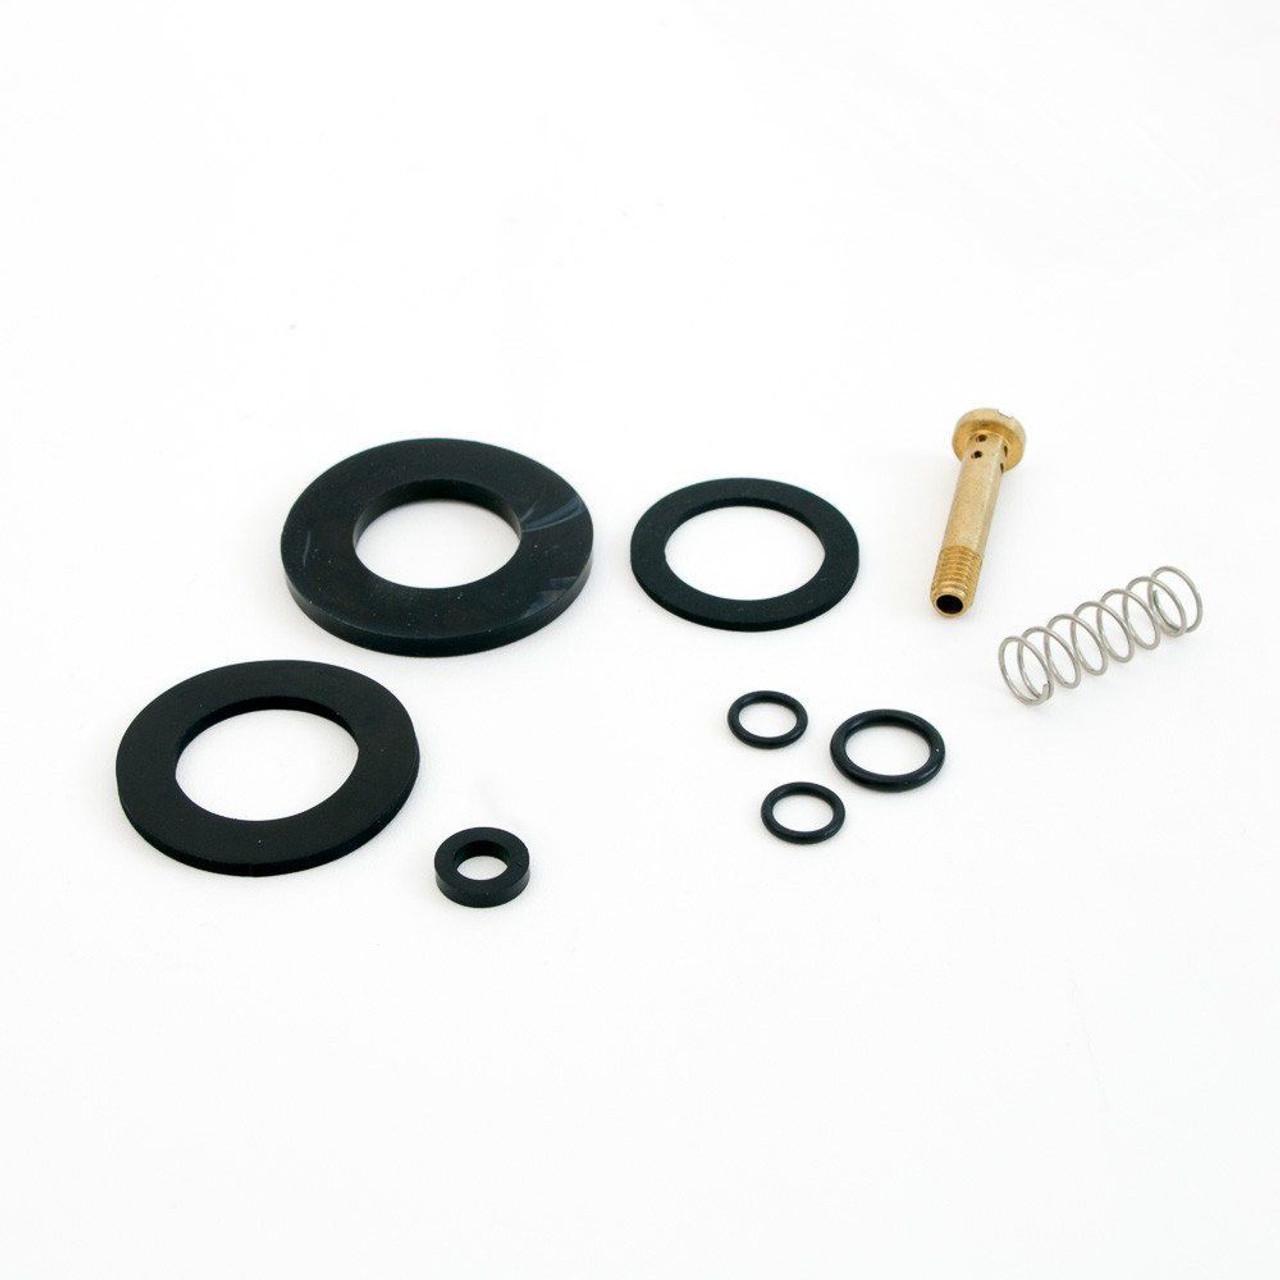 Rinser Rebuild Kit for Espresso Parts Rinsers